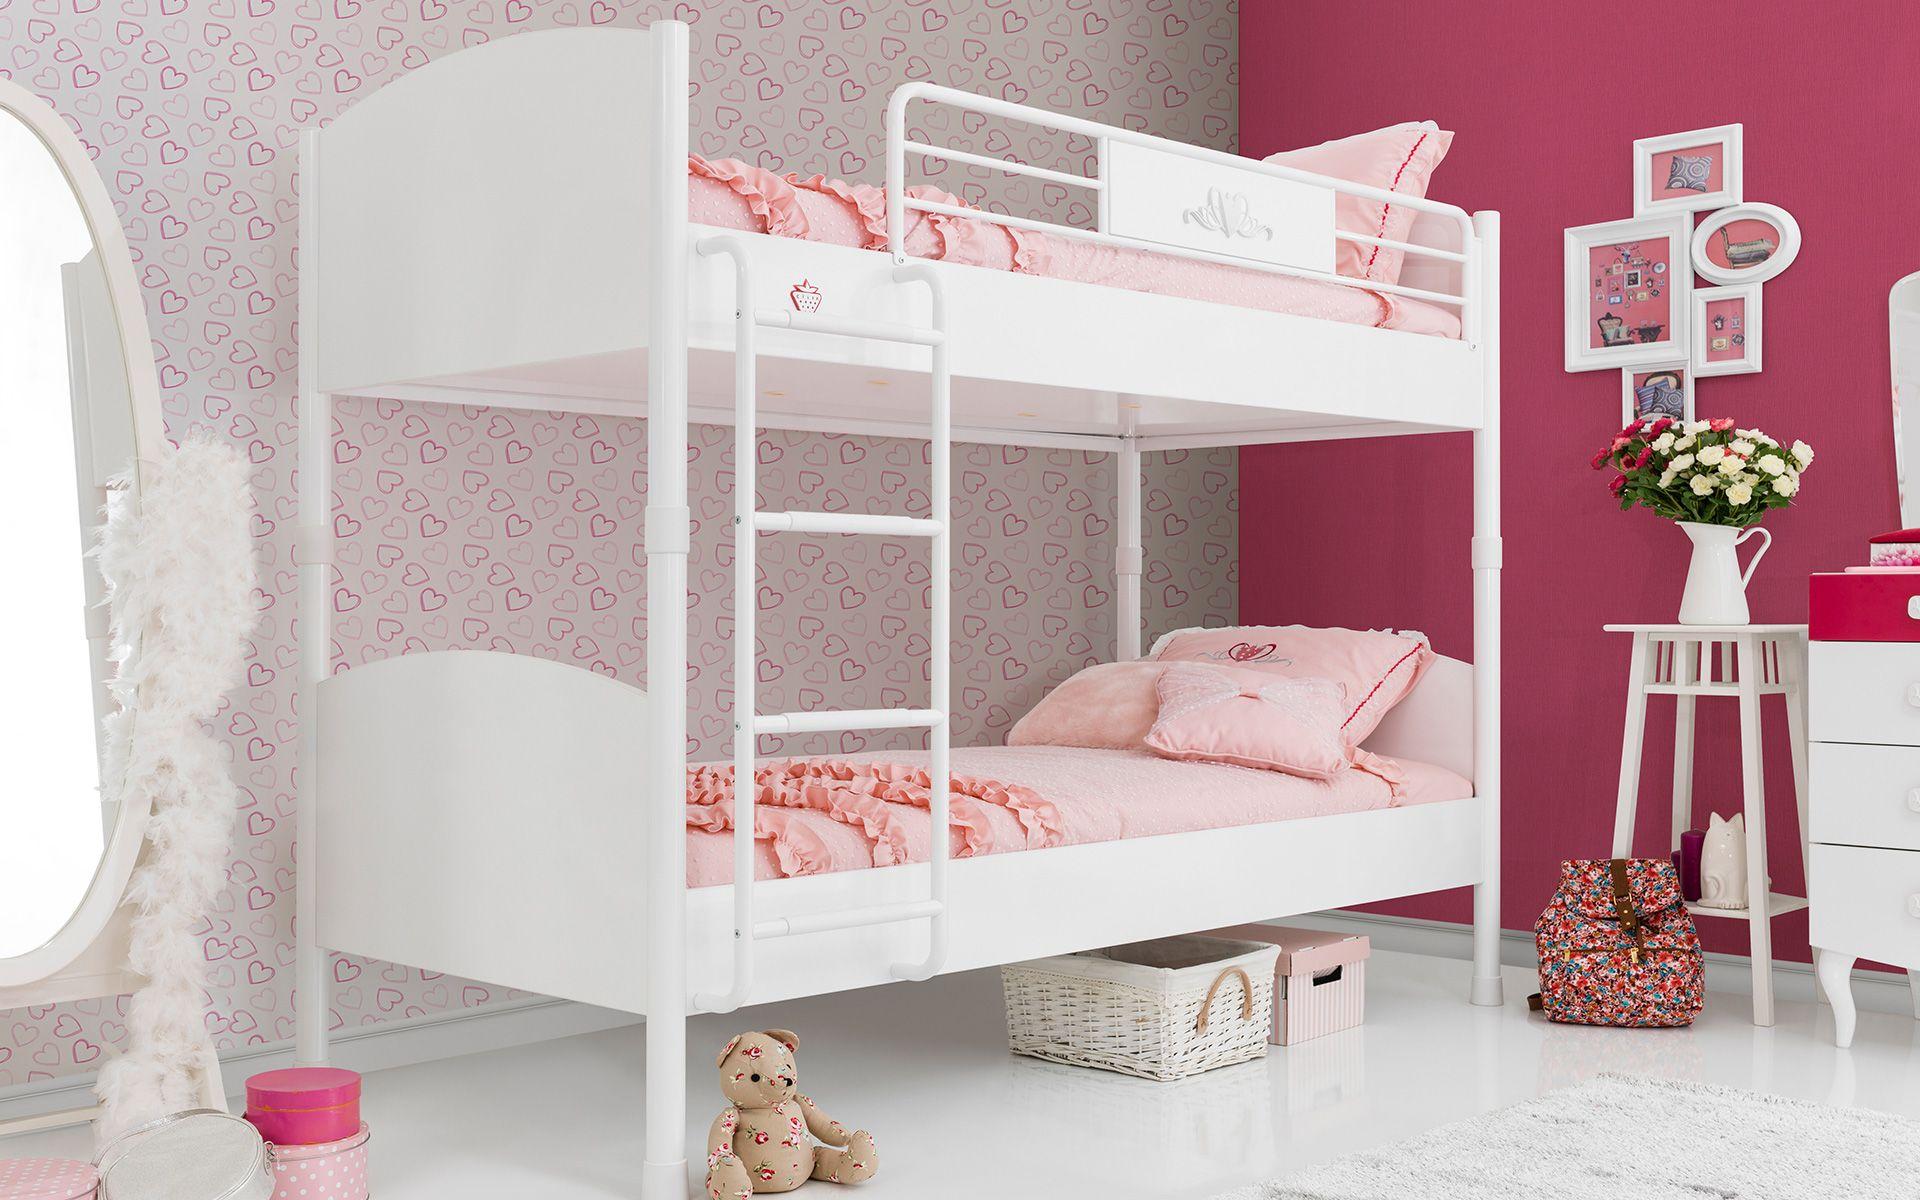 #yakut #çilekodasi #cilekroom #decoration #dekorasyon #genc #oda #pembe #beyaz #pembeoda #beyazoda #klasik #white #pink #yatak #bed #ranza